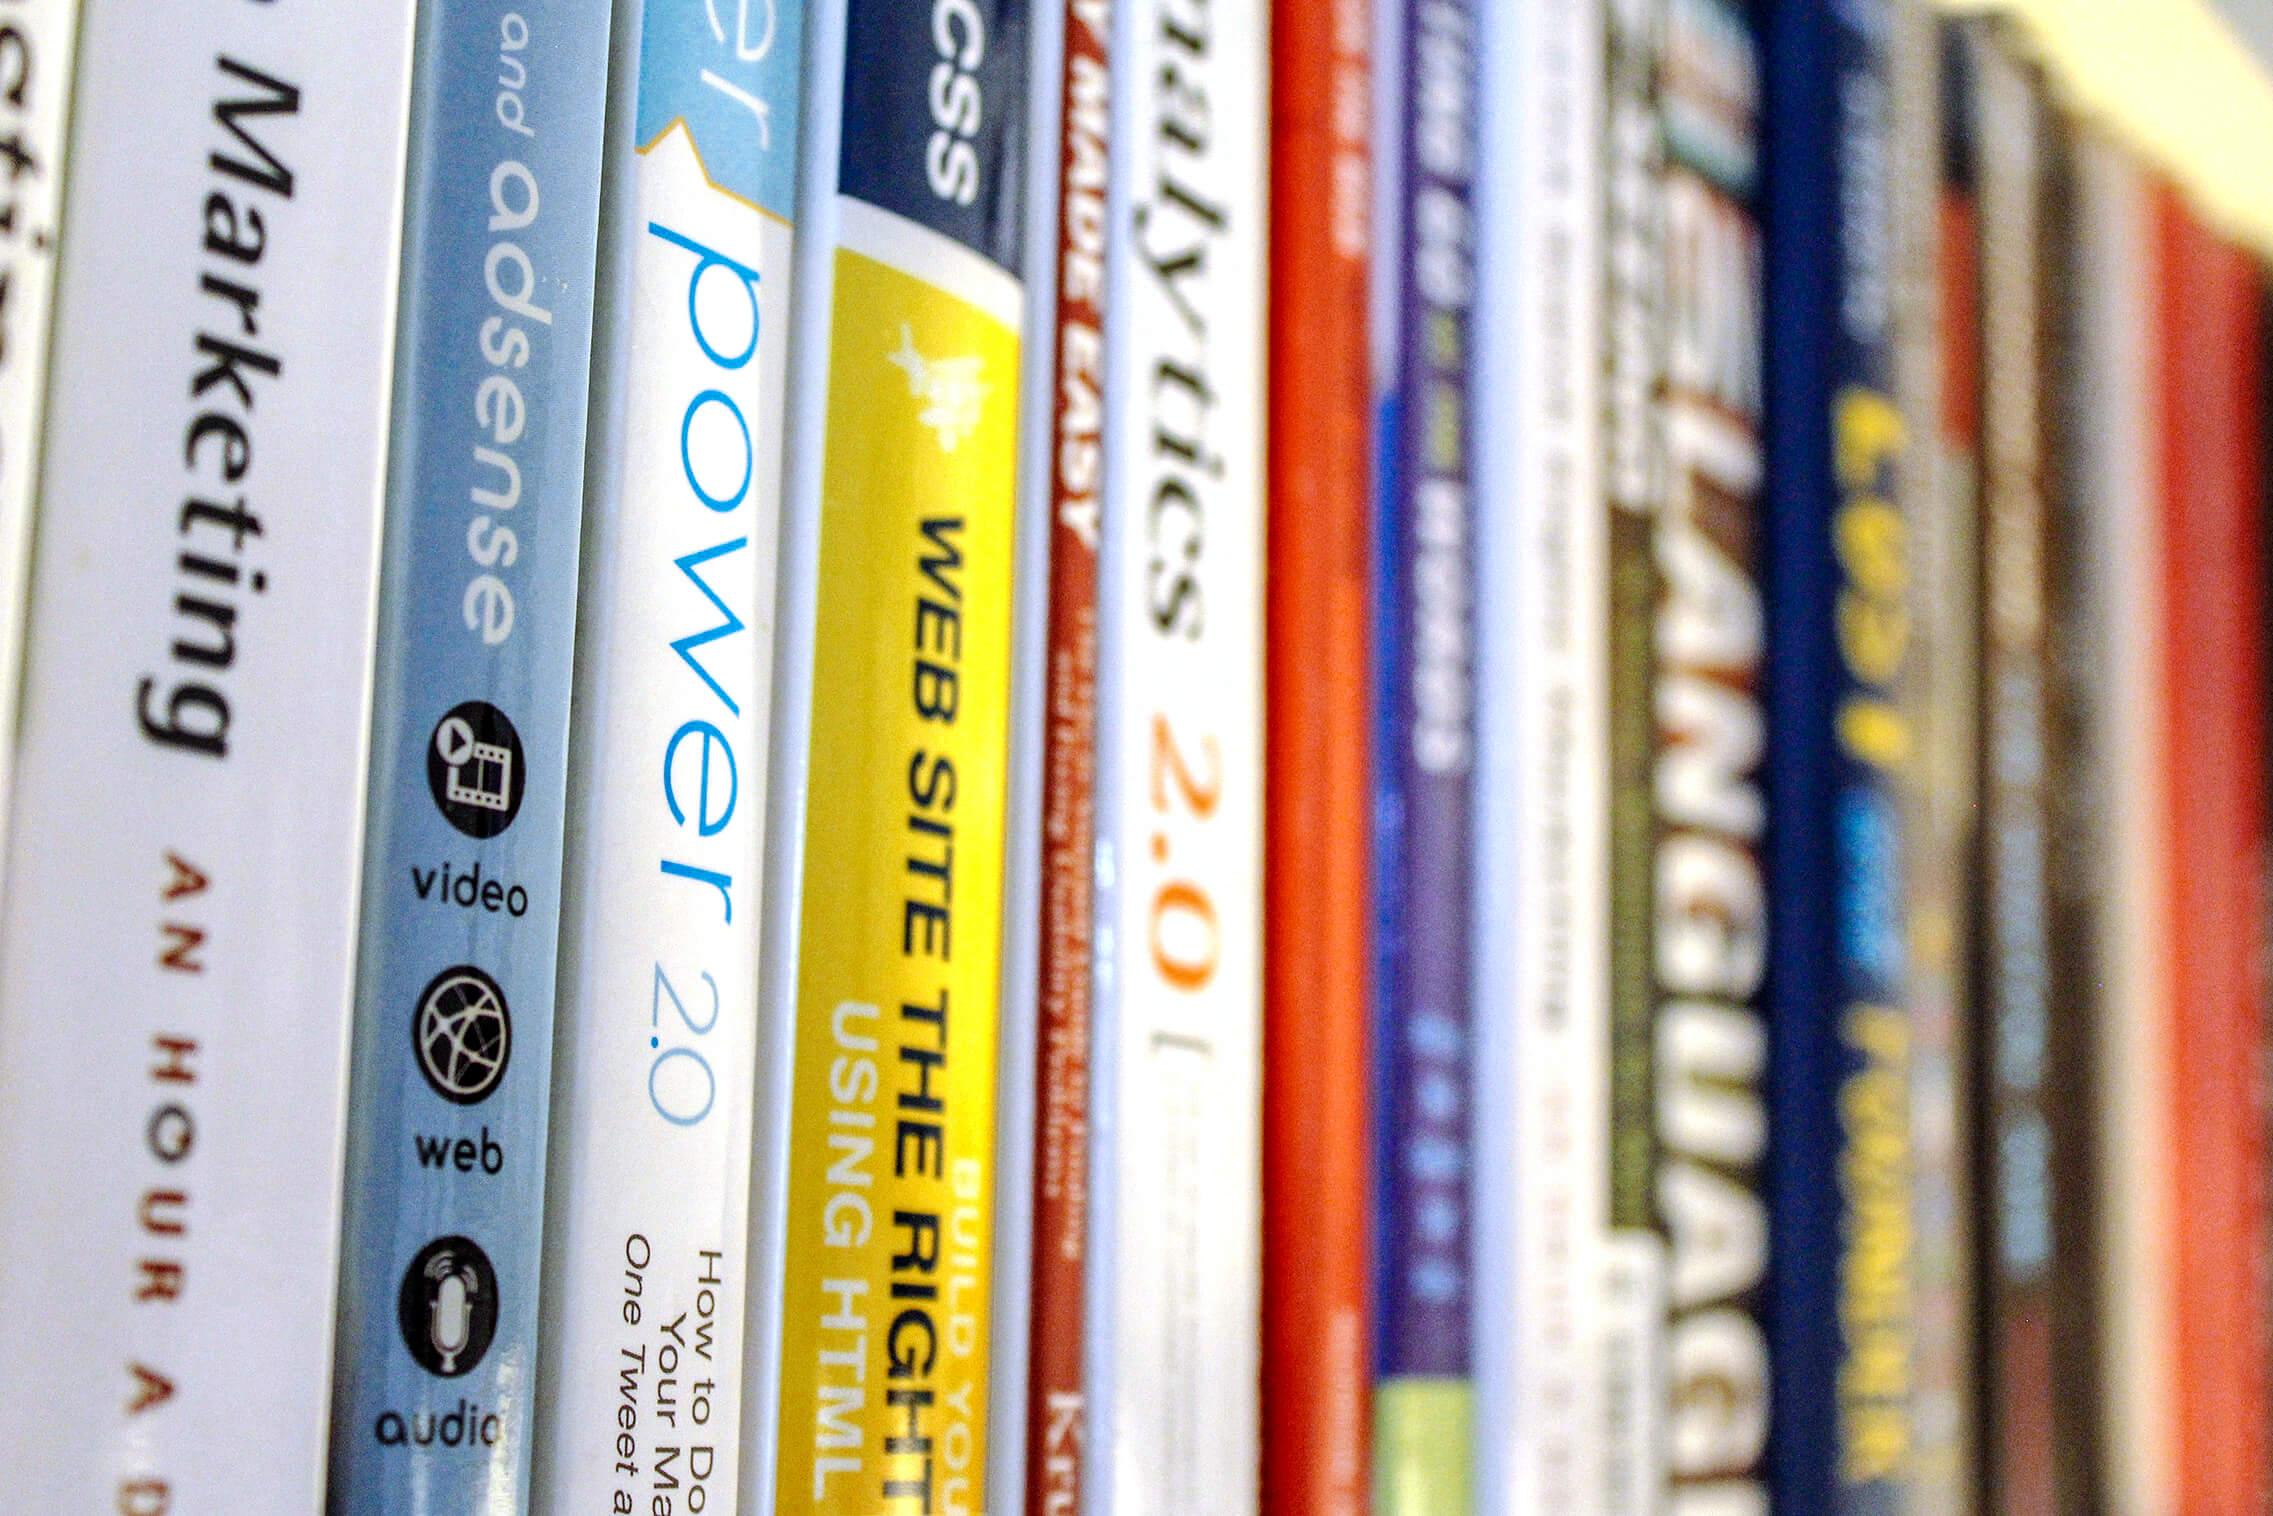 Digital marketing books on shelf